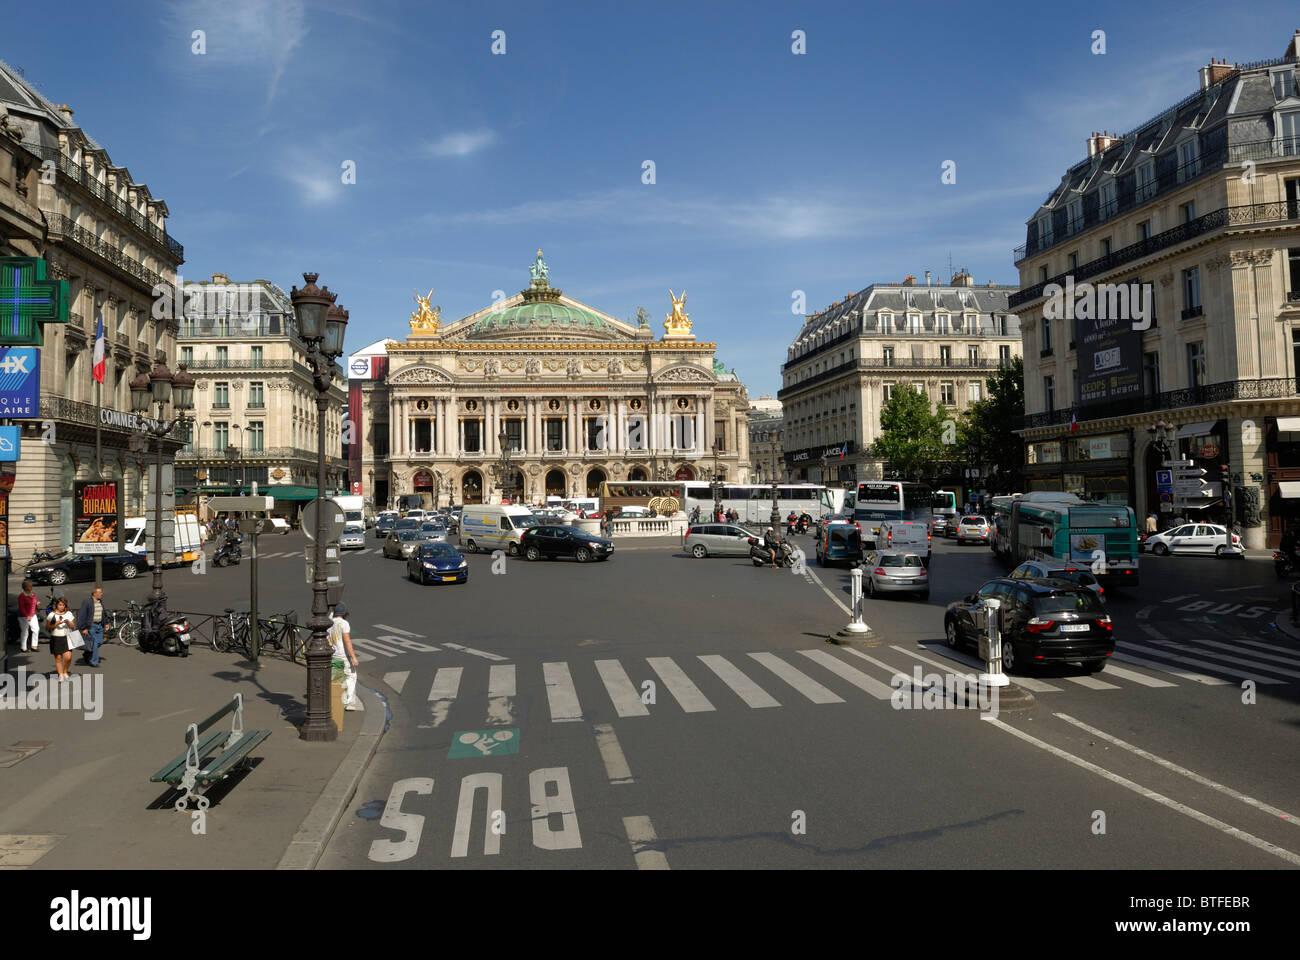 place de l 39 opera palais garnier as seen from avenue de l 39 opera stock photo royalty free. Black Bedroom Furniture Sets. Home Design Ideas